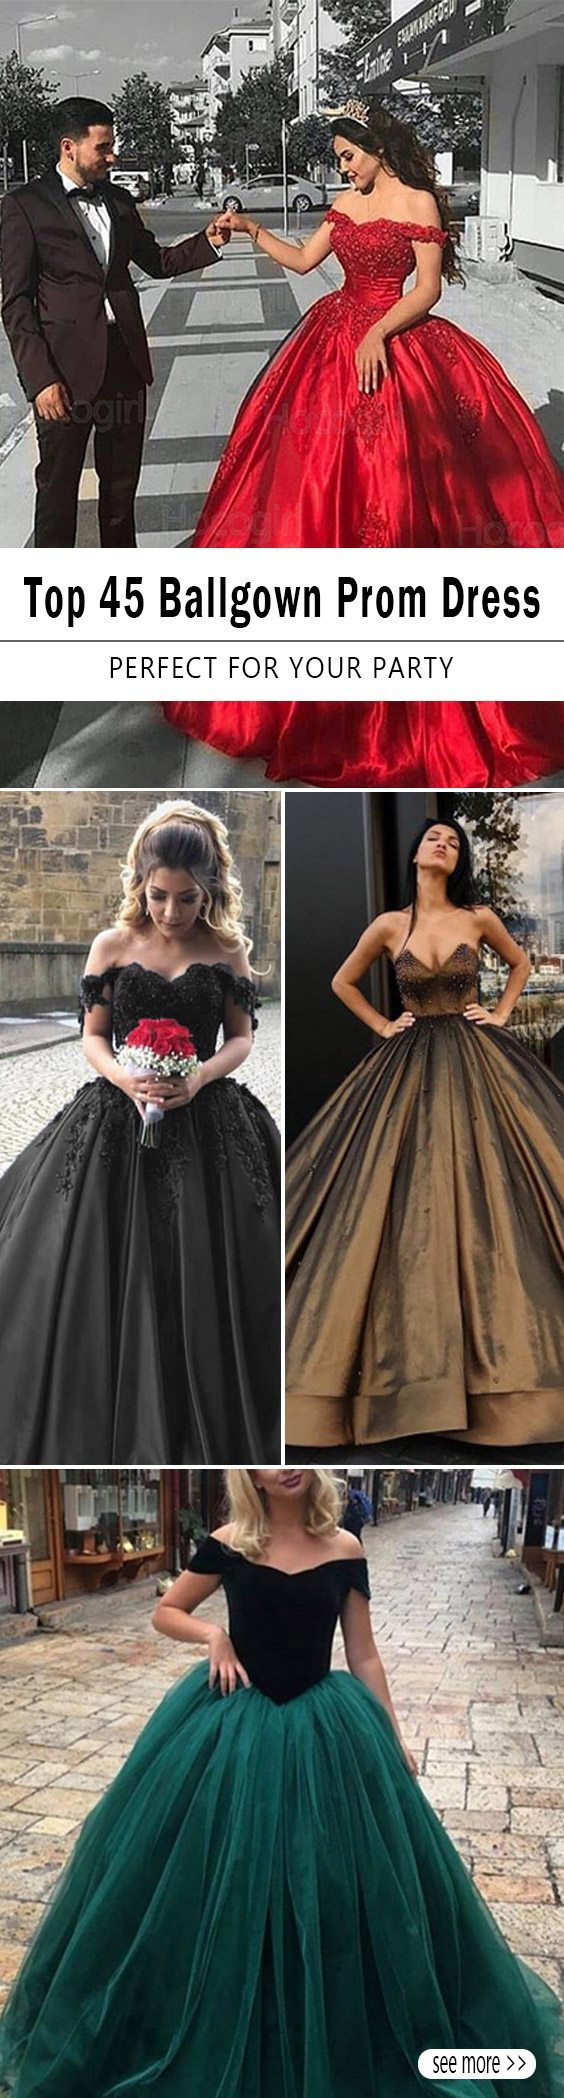 45 Ballgown Prom Dresses